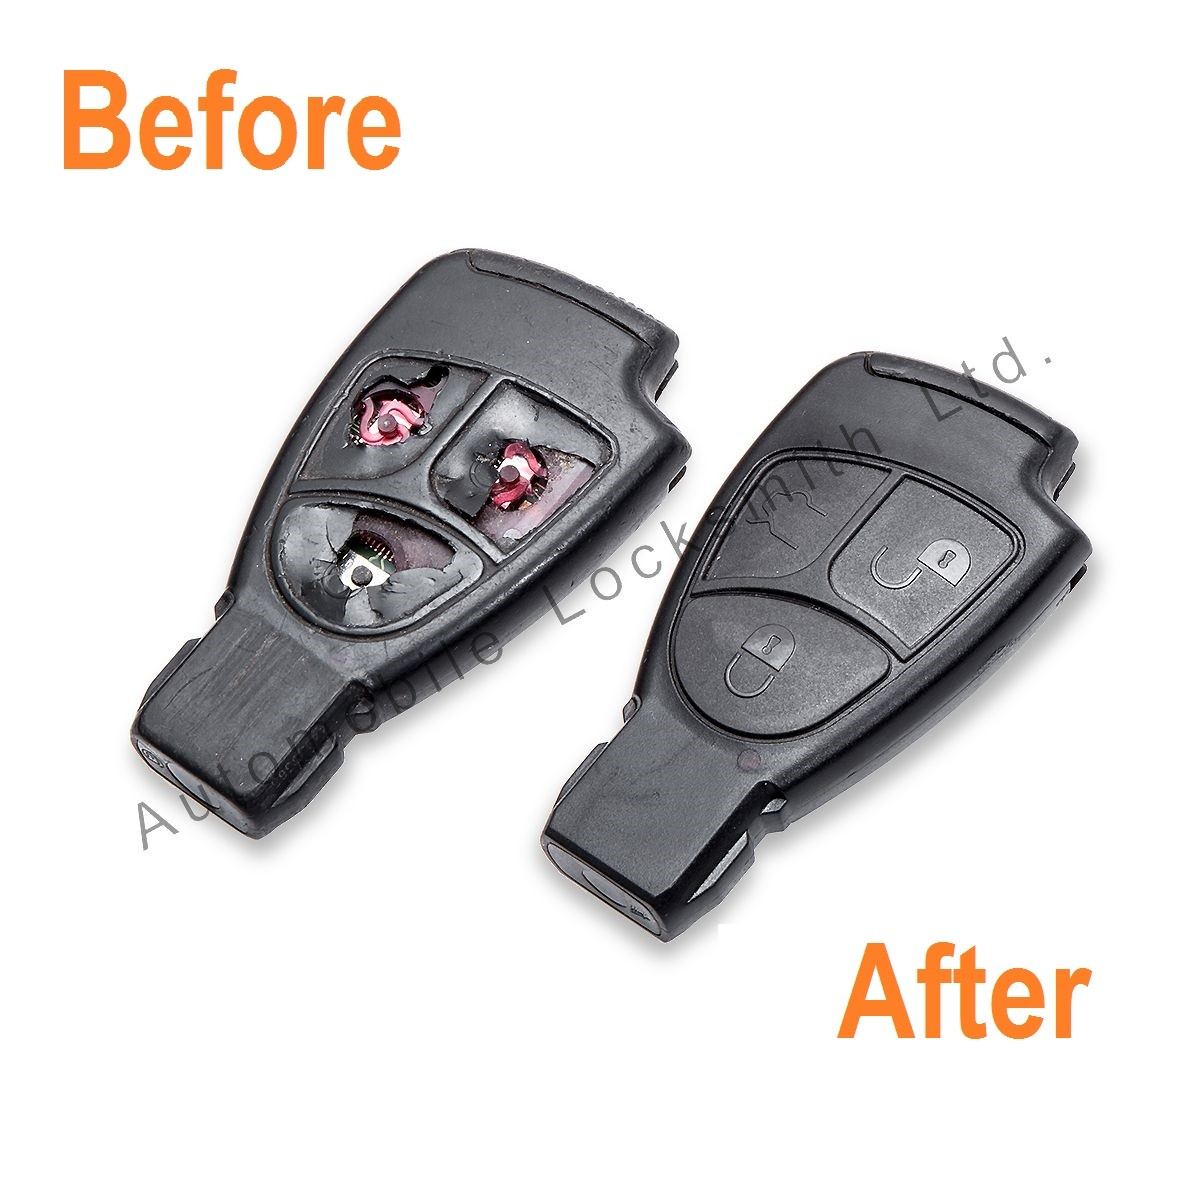 Repair Service for Mercedes 3 button remote smart key